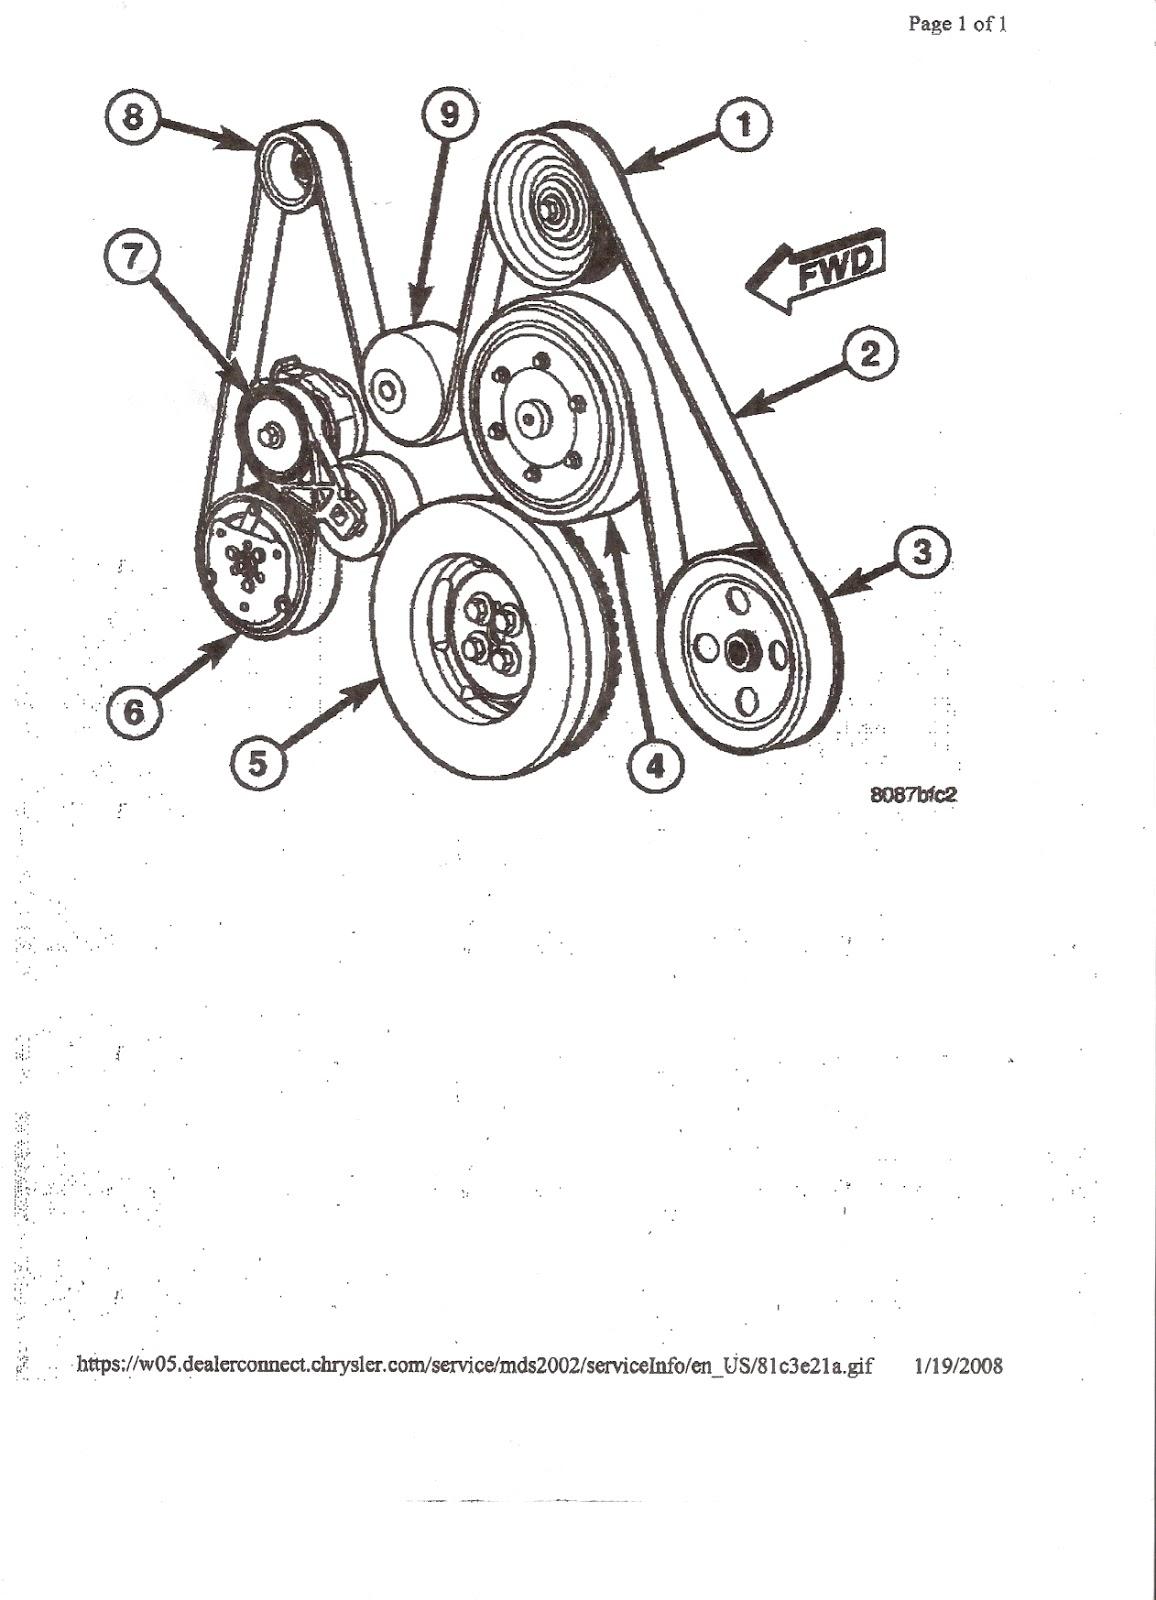 Admirable 2006 Dodge Ram 5 7 Hemi Serpentine Belt Diagram Wiring Diagram Experts Wiring Cloud Xortanetembamohammedshrineorg